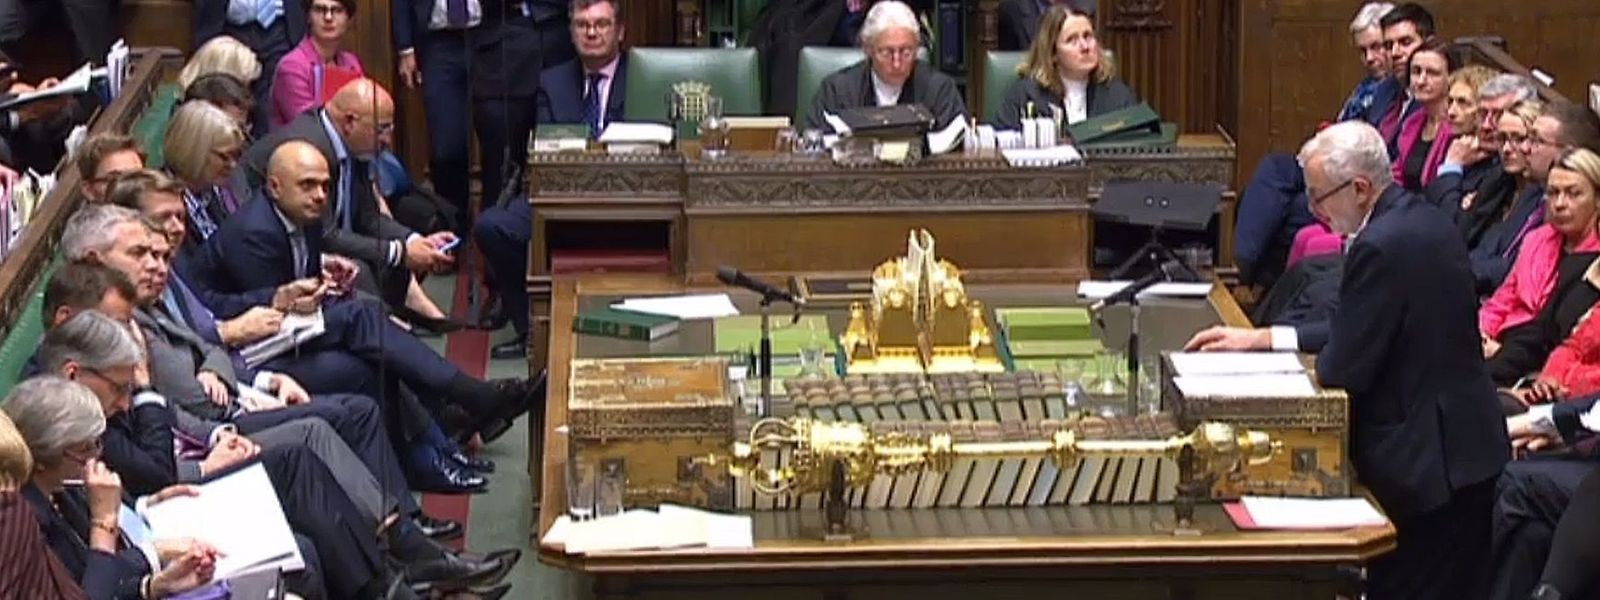 Jeremy Corbyn encara a primeira-minstra Theresa May no parlamento britânico.